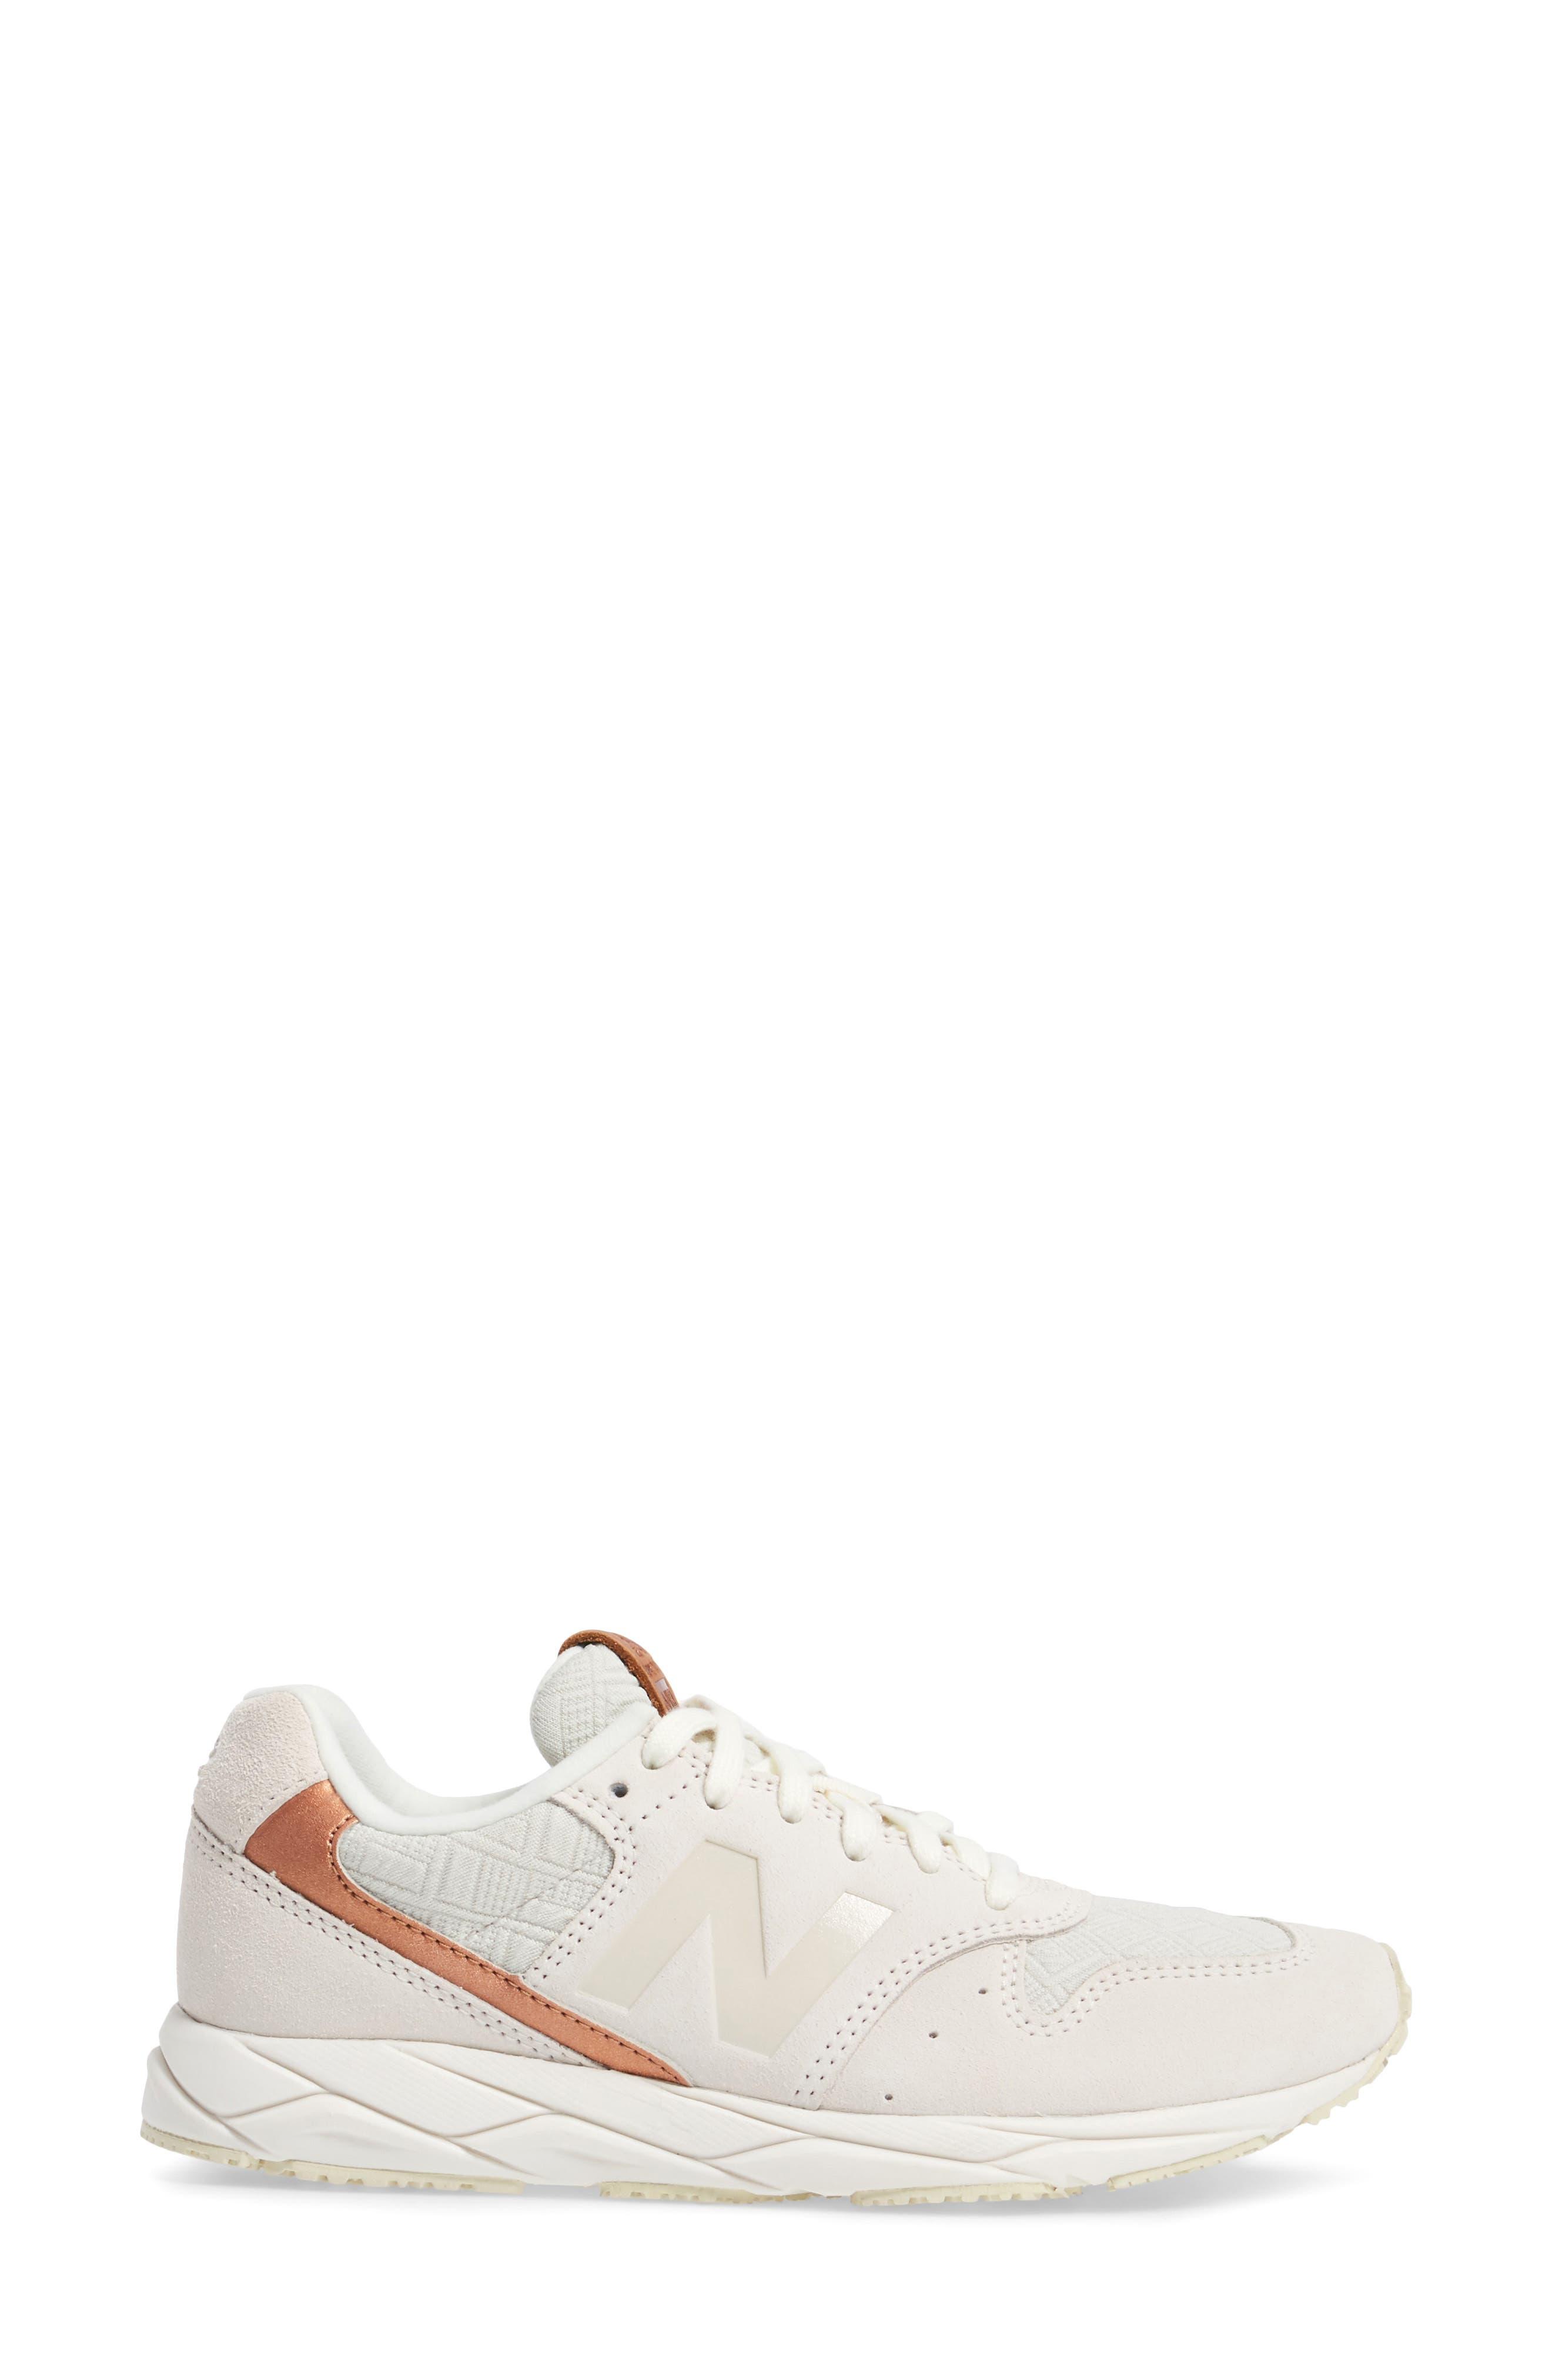 96 Mash-Up Sneaker,                             Alternate thumbnail 3, color,                             250